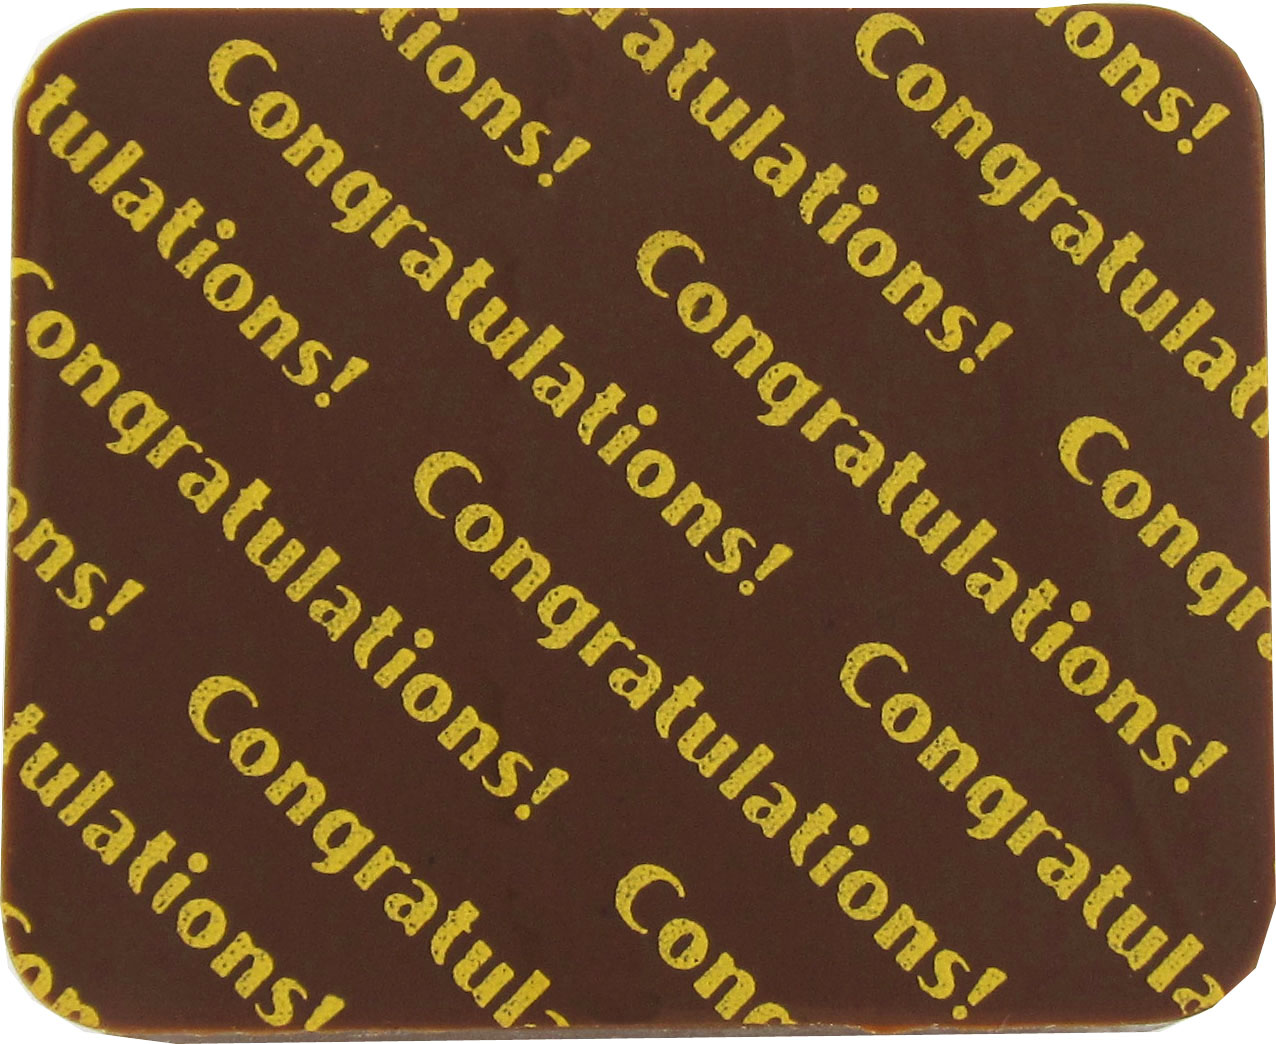 Congrat gld